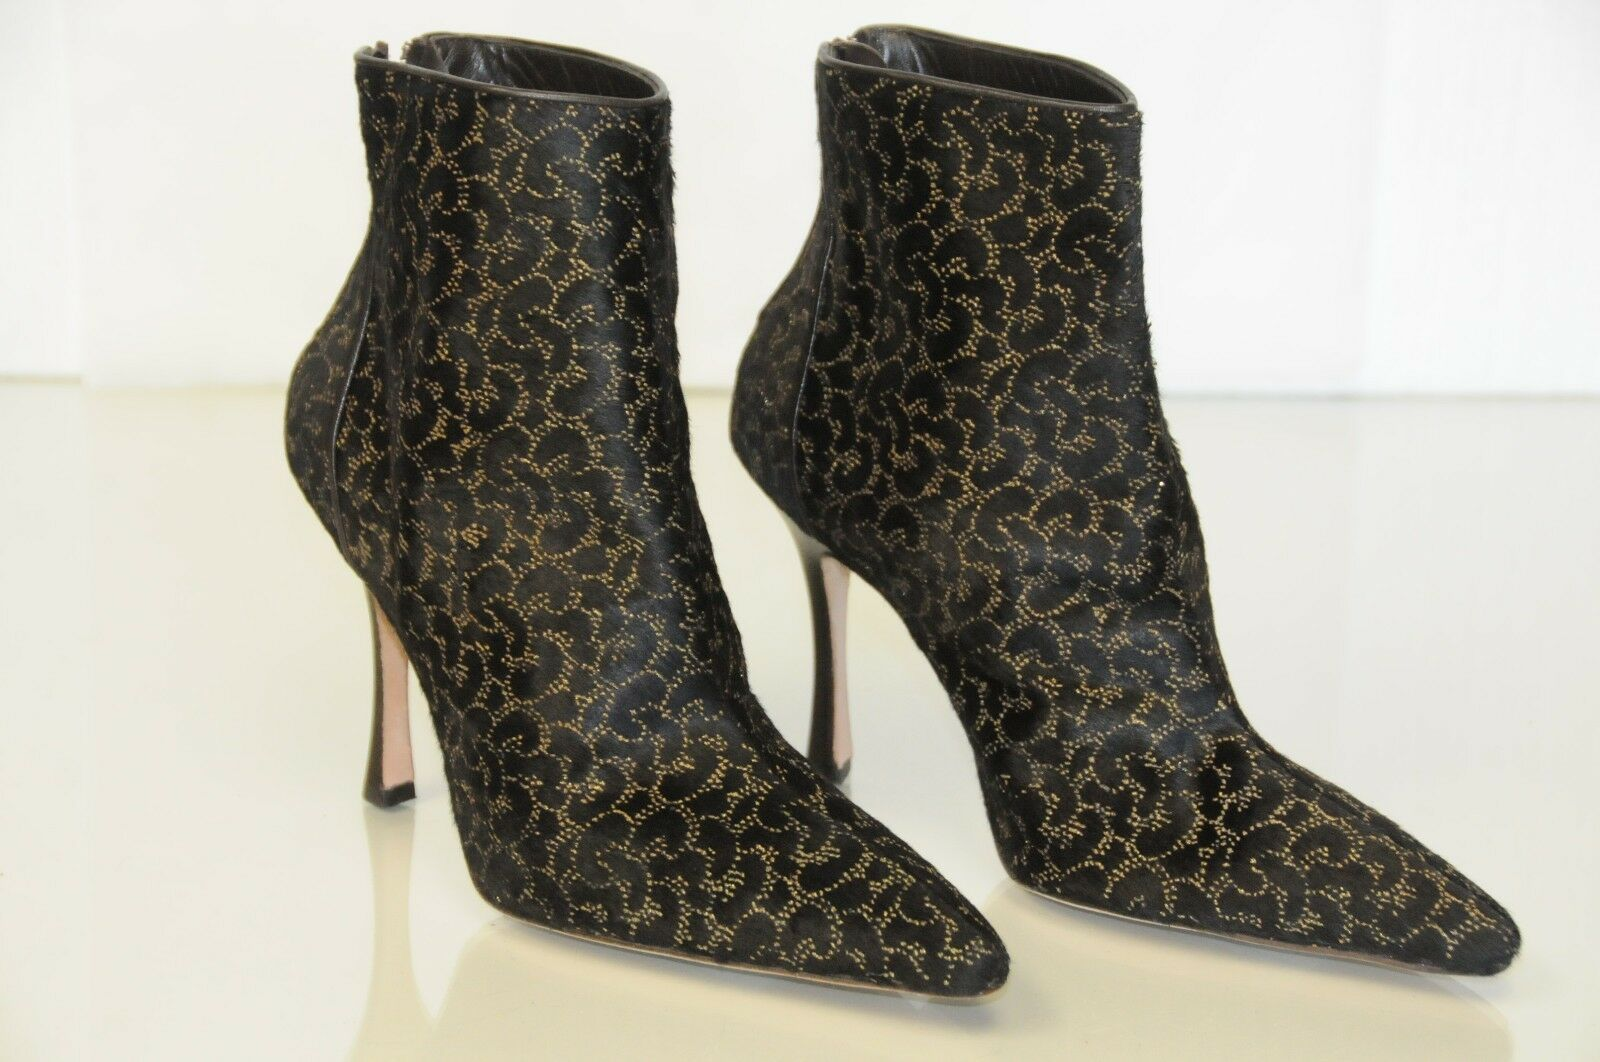 1495 NEW MANOLO BLAHNIK BB ANKLE Stiefel Stiefel Stiefel HAIR PONY Dark braun Gold schuhe 37 0a7003